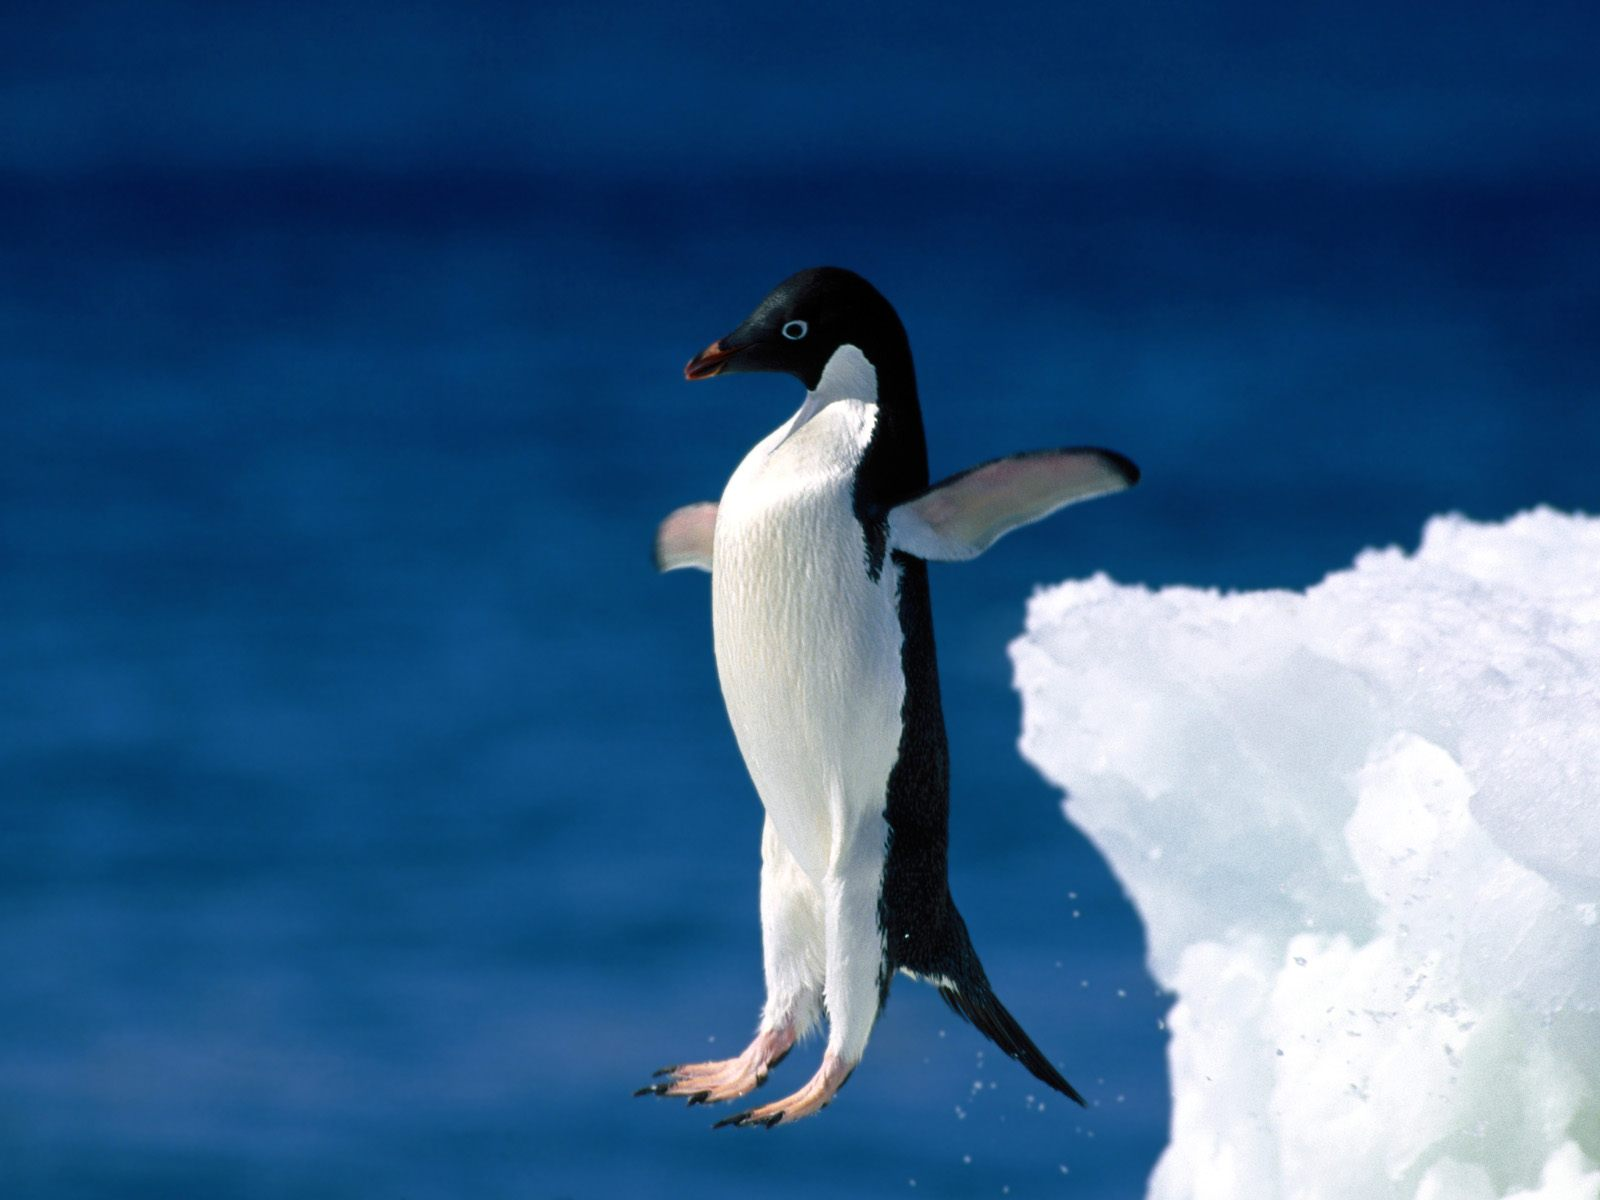 Penguine jumping